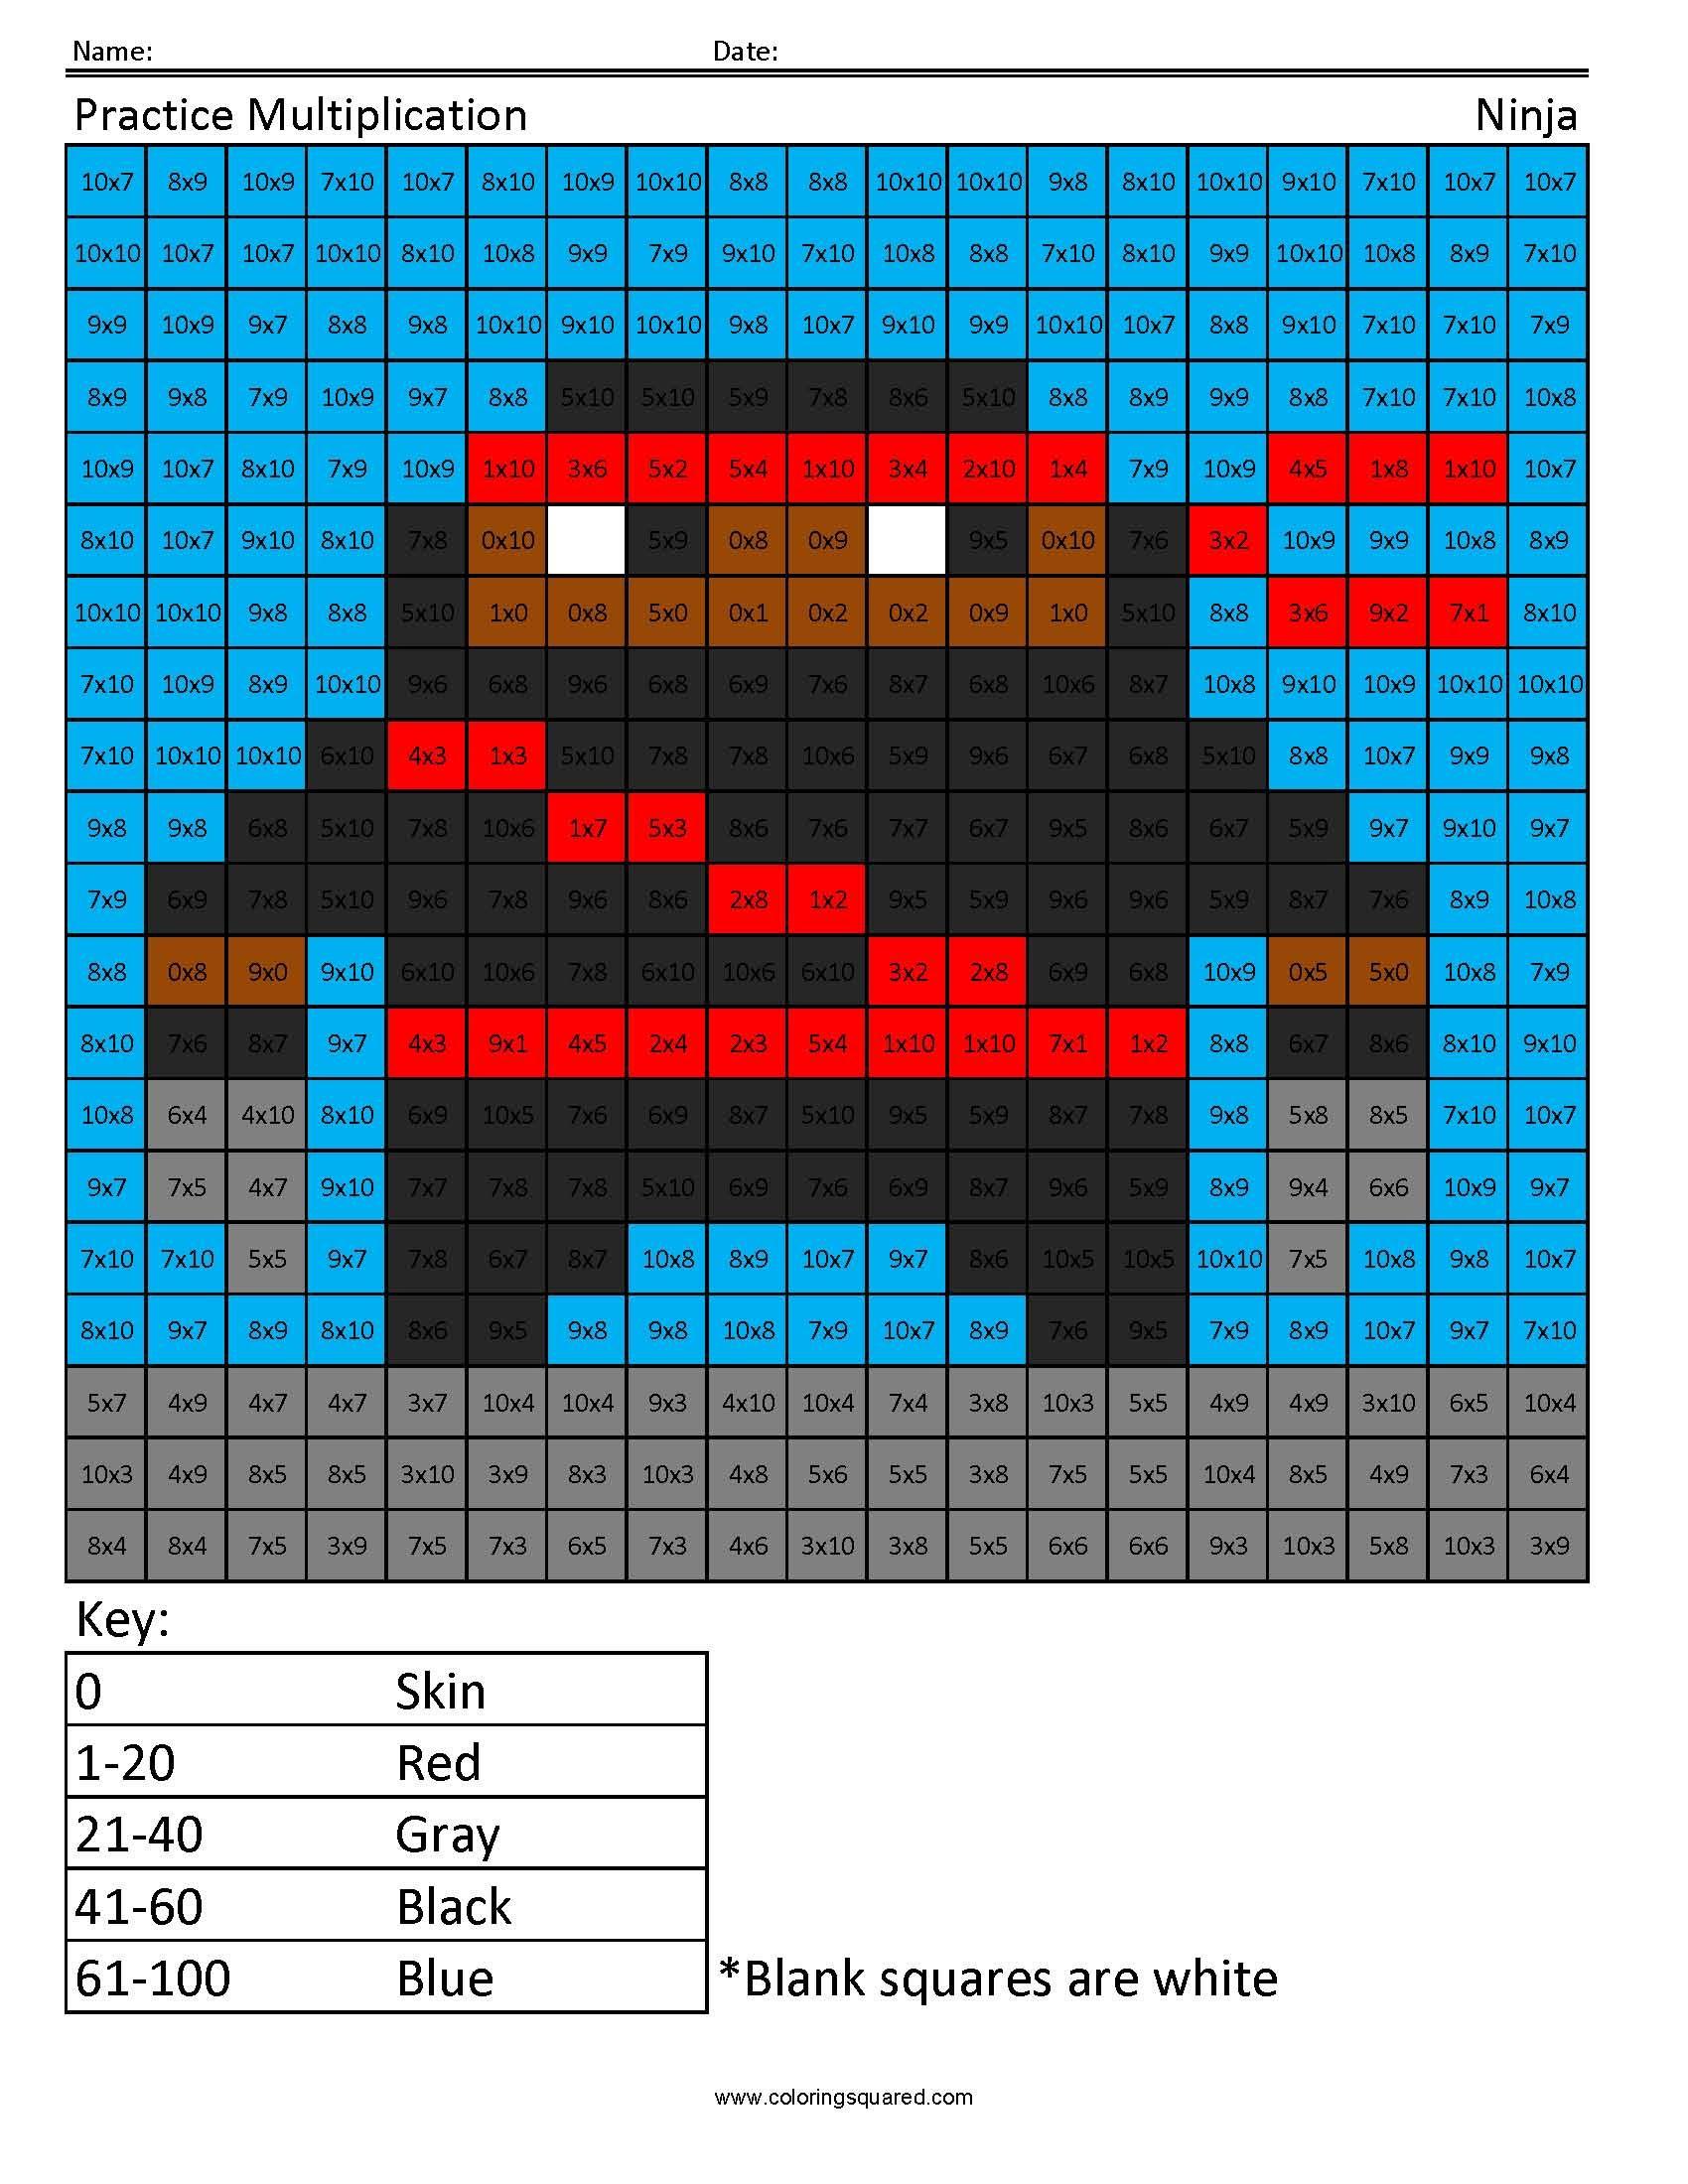 Practice Multiplication Ninja